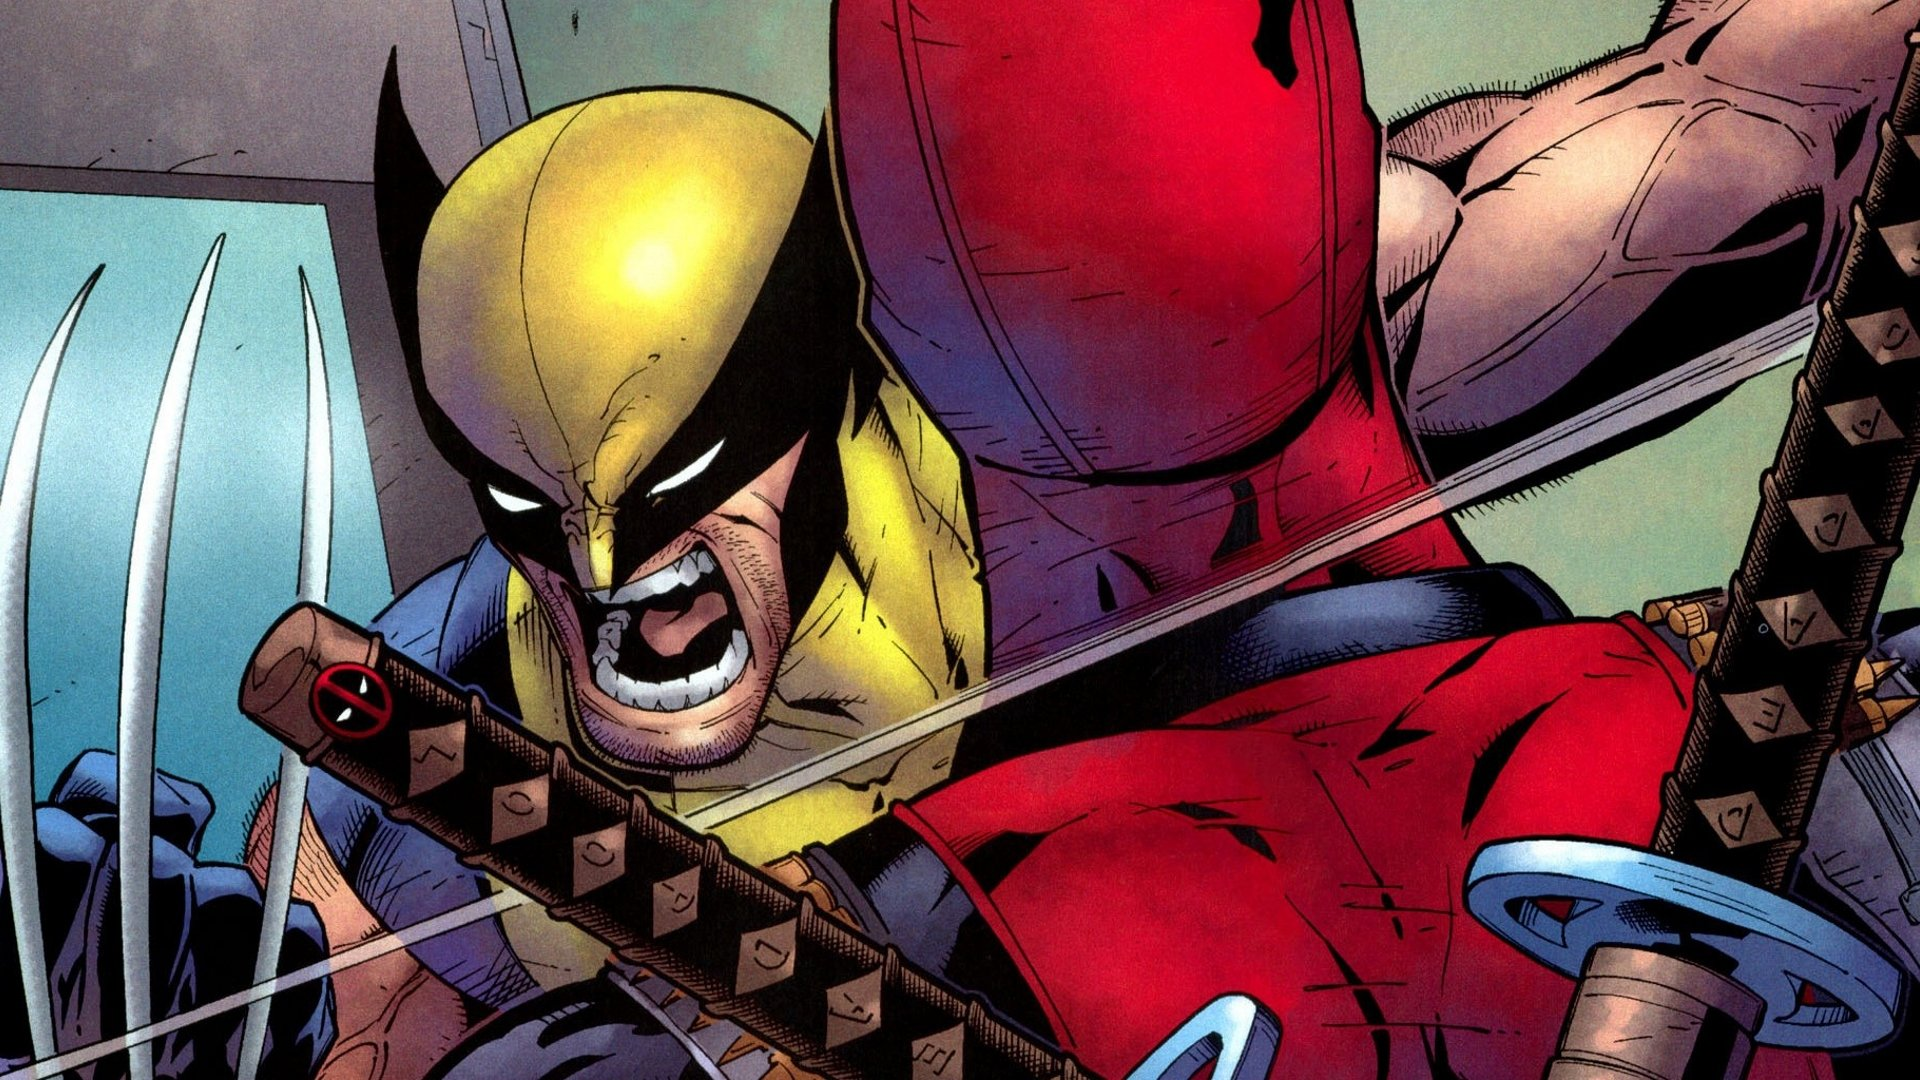 3 X Men Origins Wolverine vs Deadpool HD Wallpapers Background 1920x1080